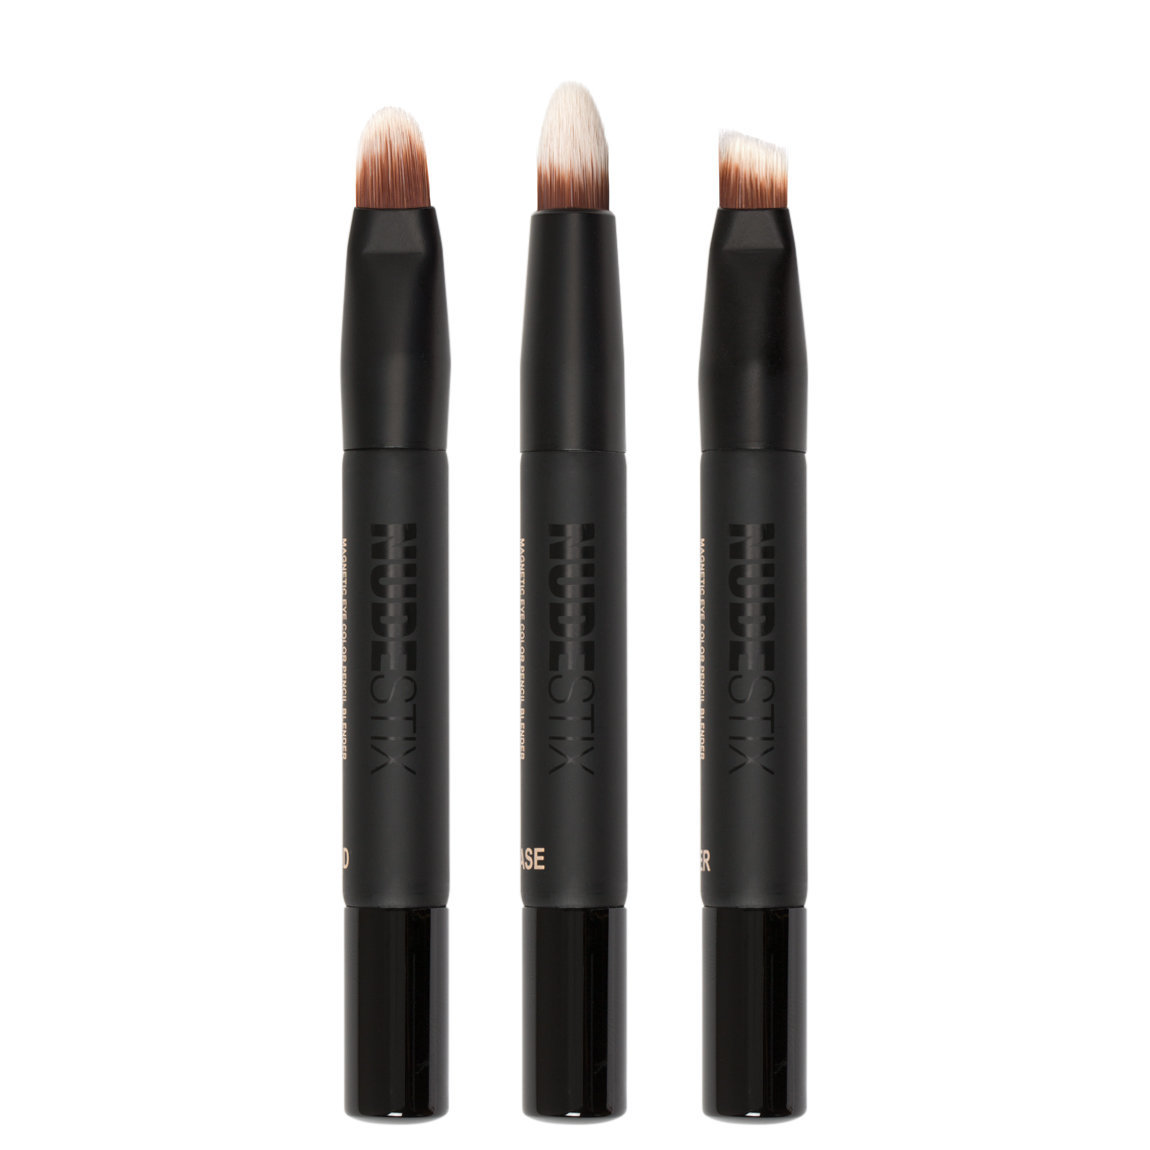 Nudestix Pencil Blenders product swatch.